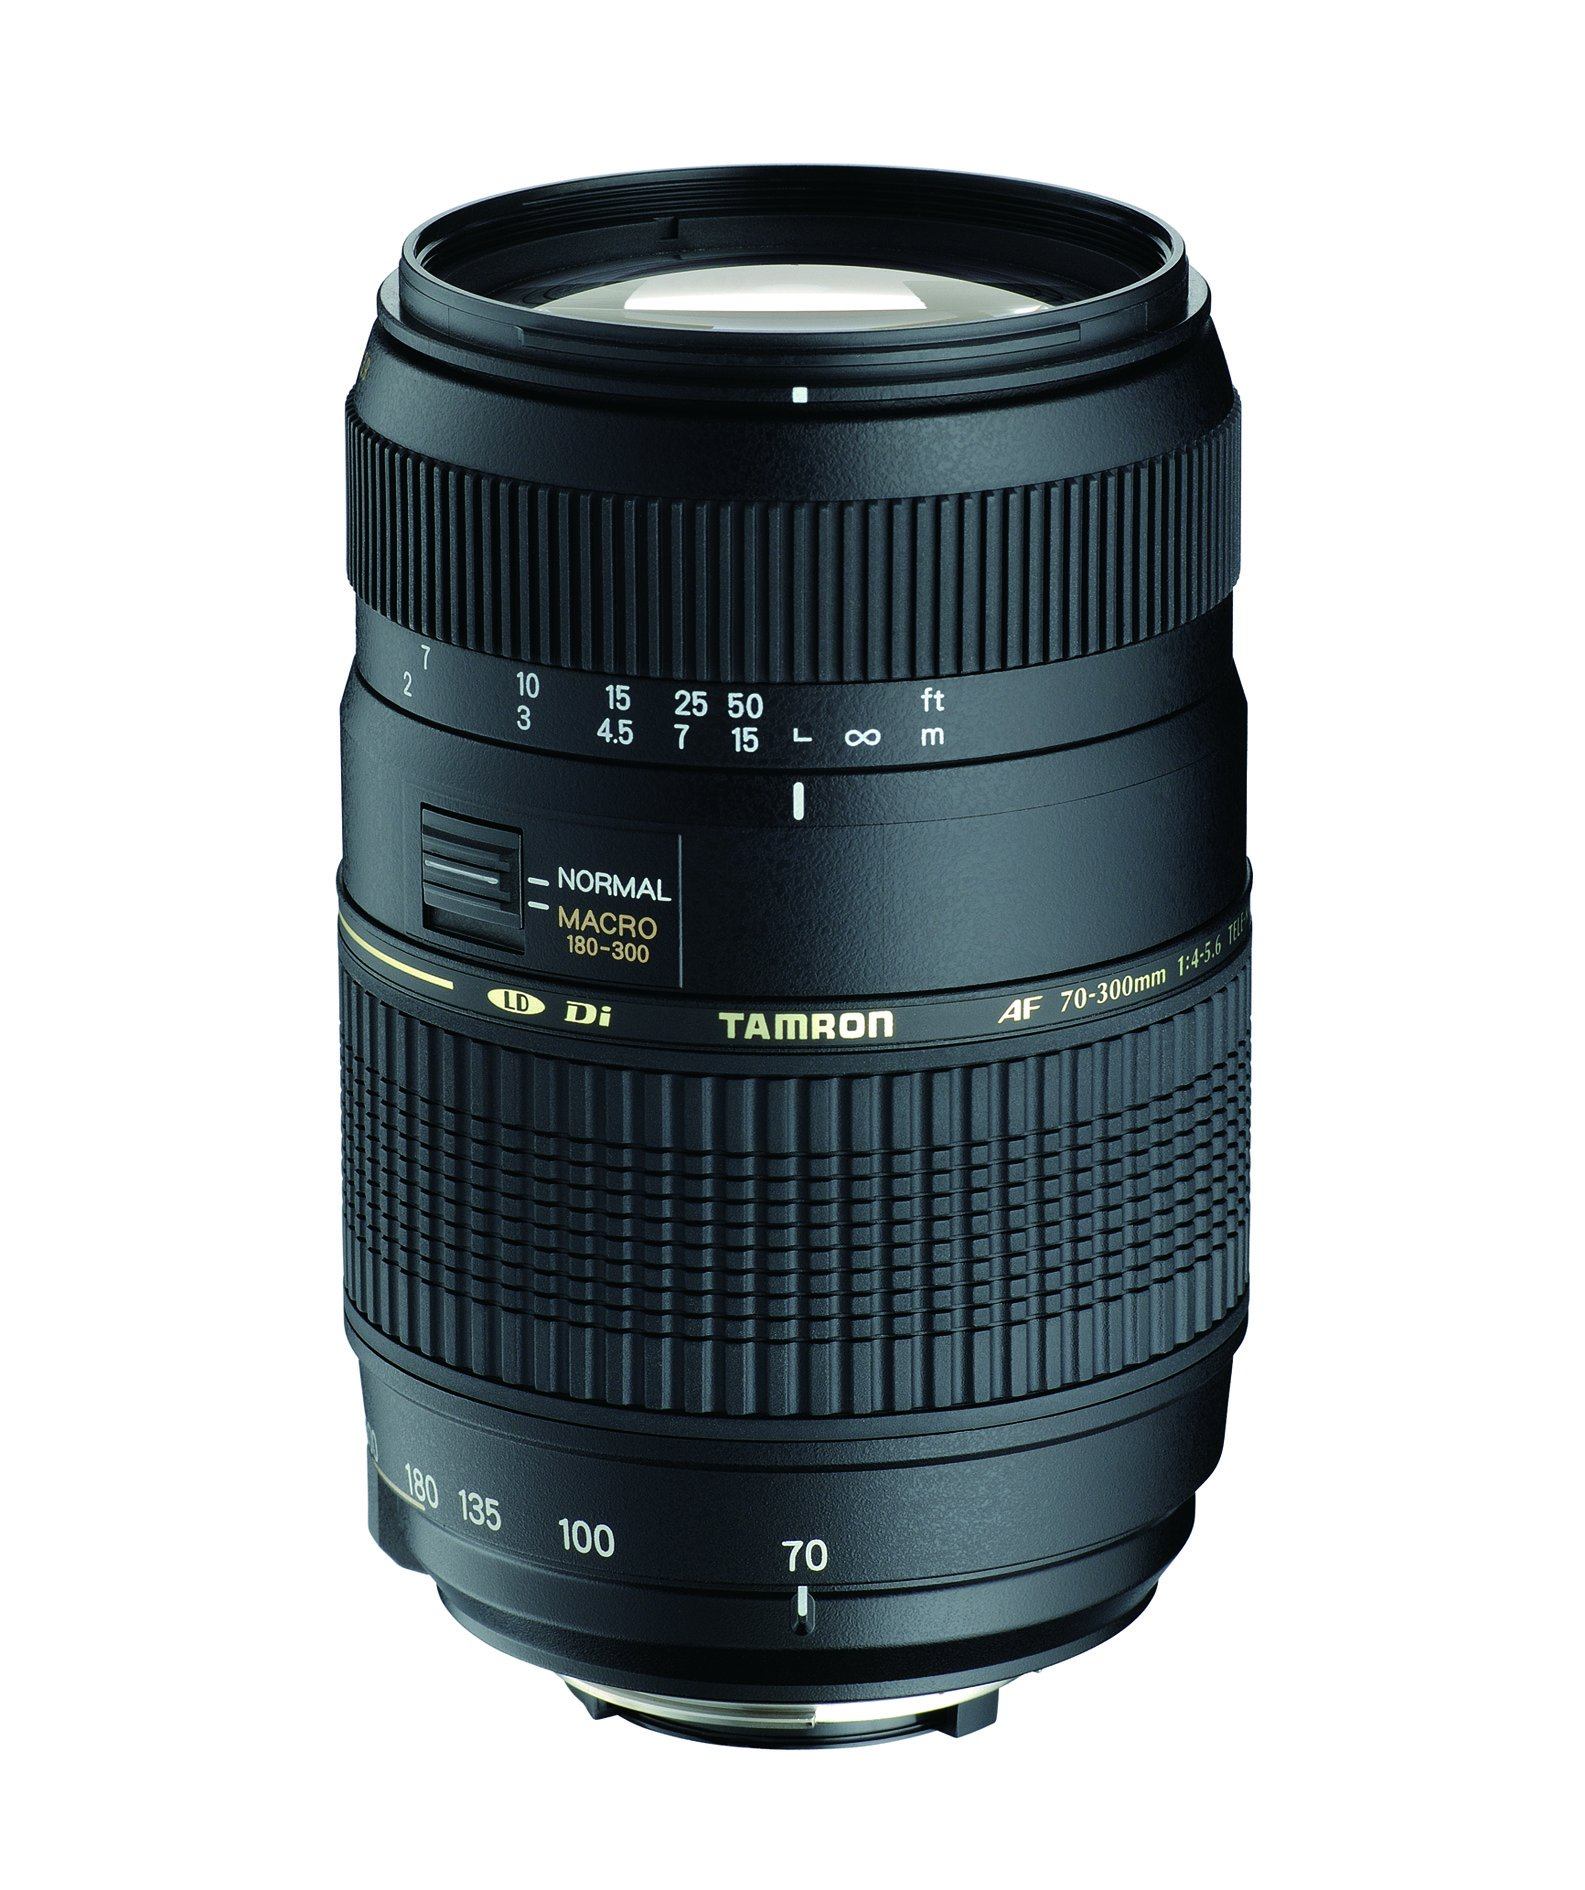 Tamron A17 70-300Mm F/4-5.6 Di Sony